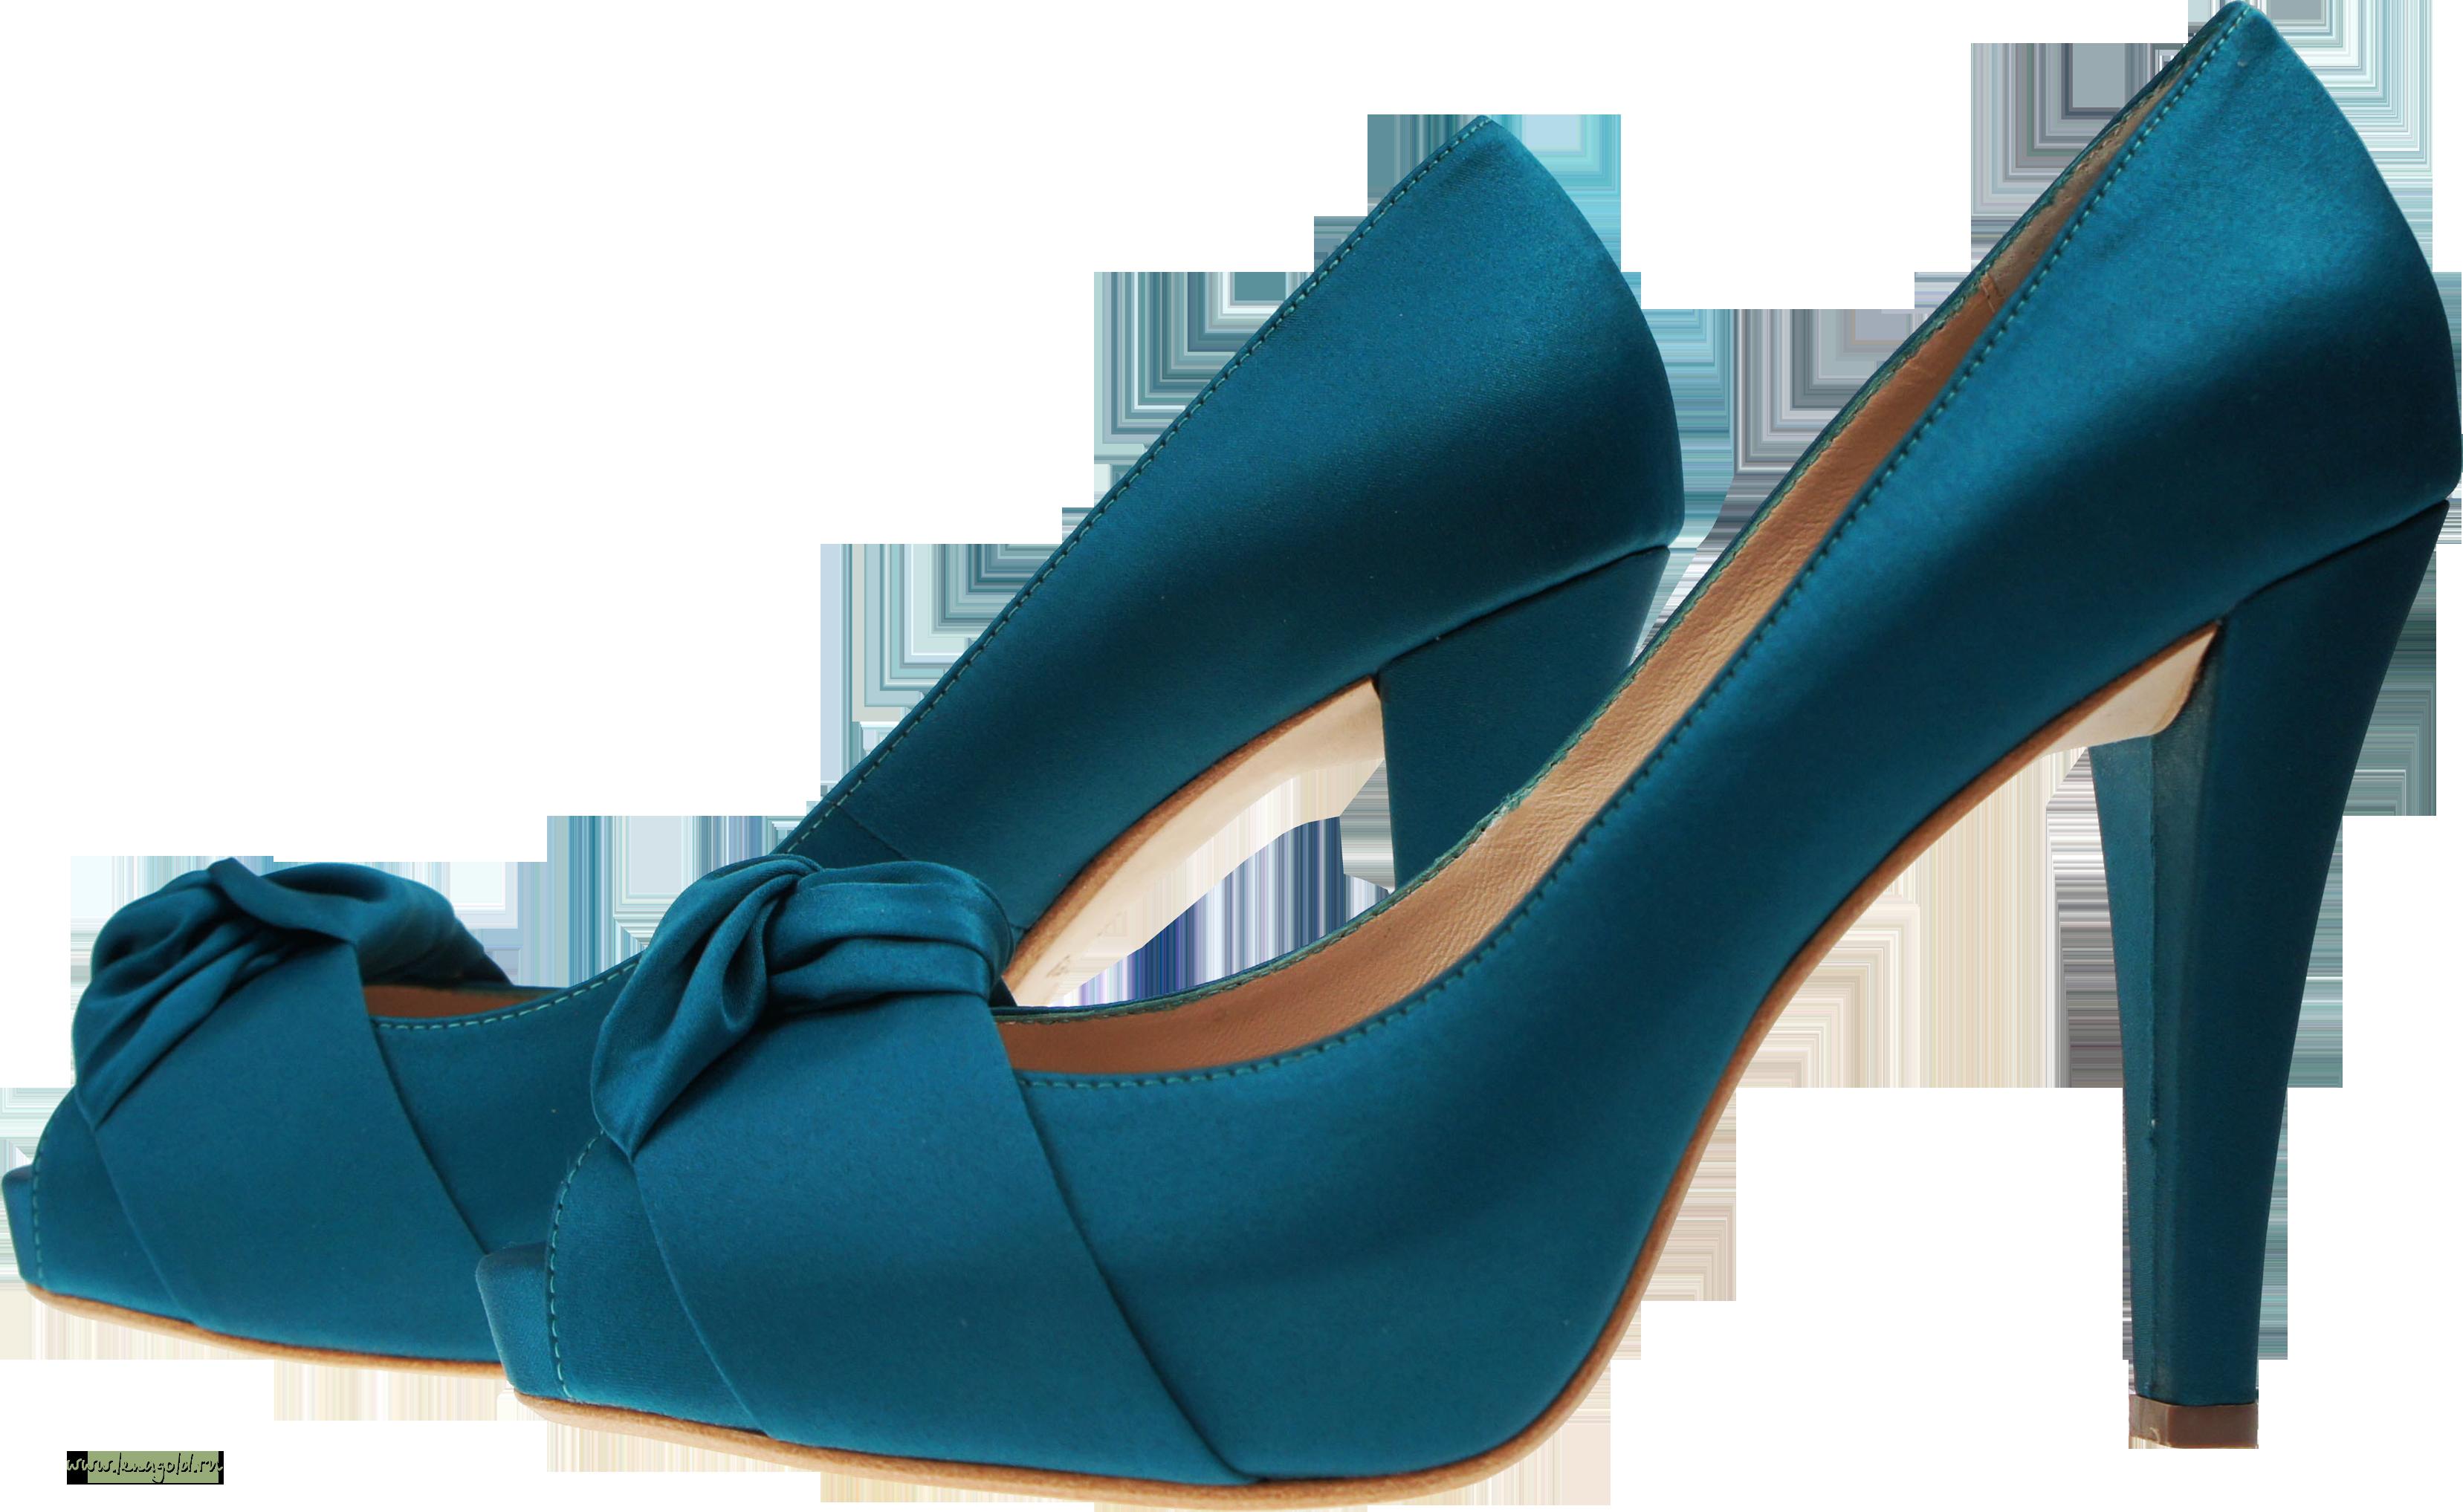 Teal Flat Dress Shoes